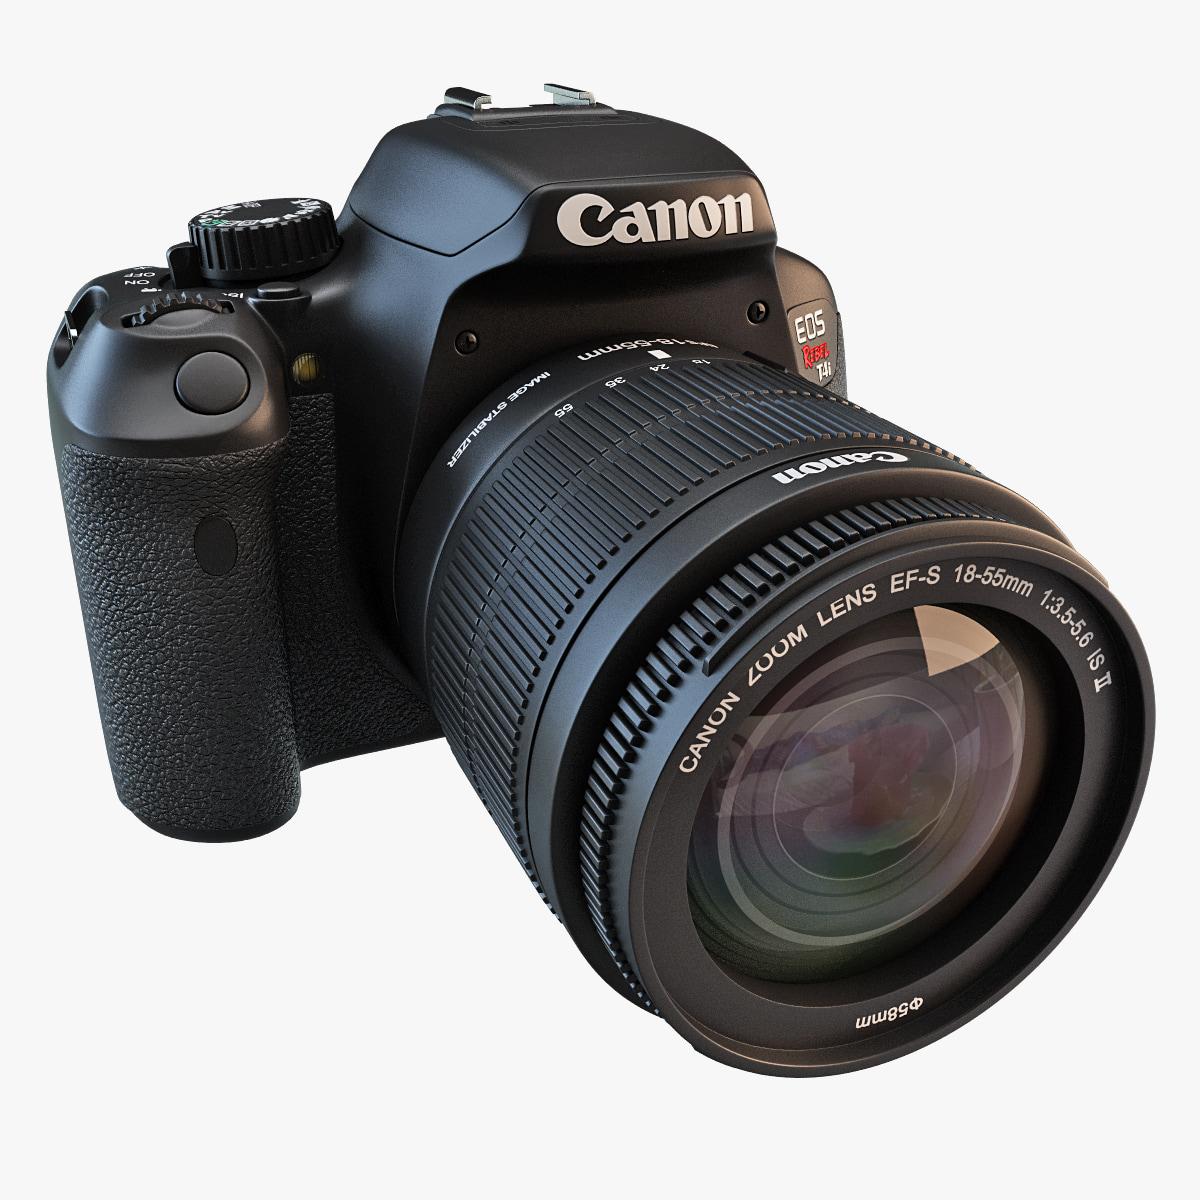 171879_Canon_EOS_Rebel_T4i_18-55mm_0000.jpg